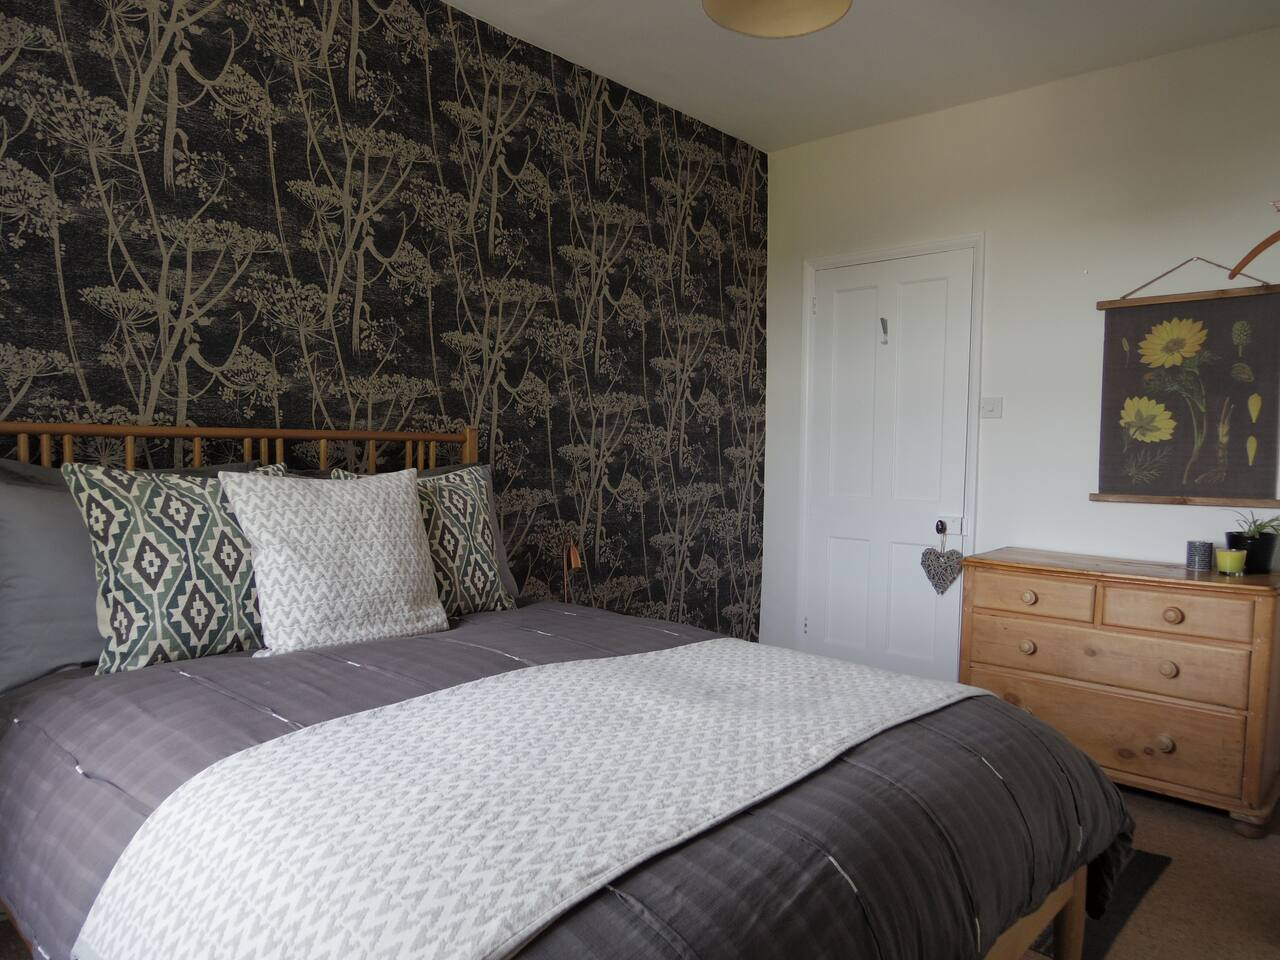 Bedroom 1 aka the Cowparsley Room